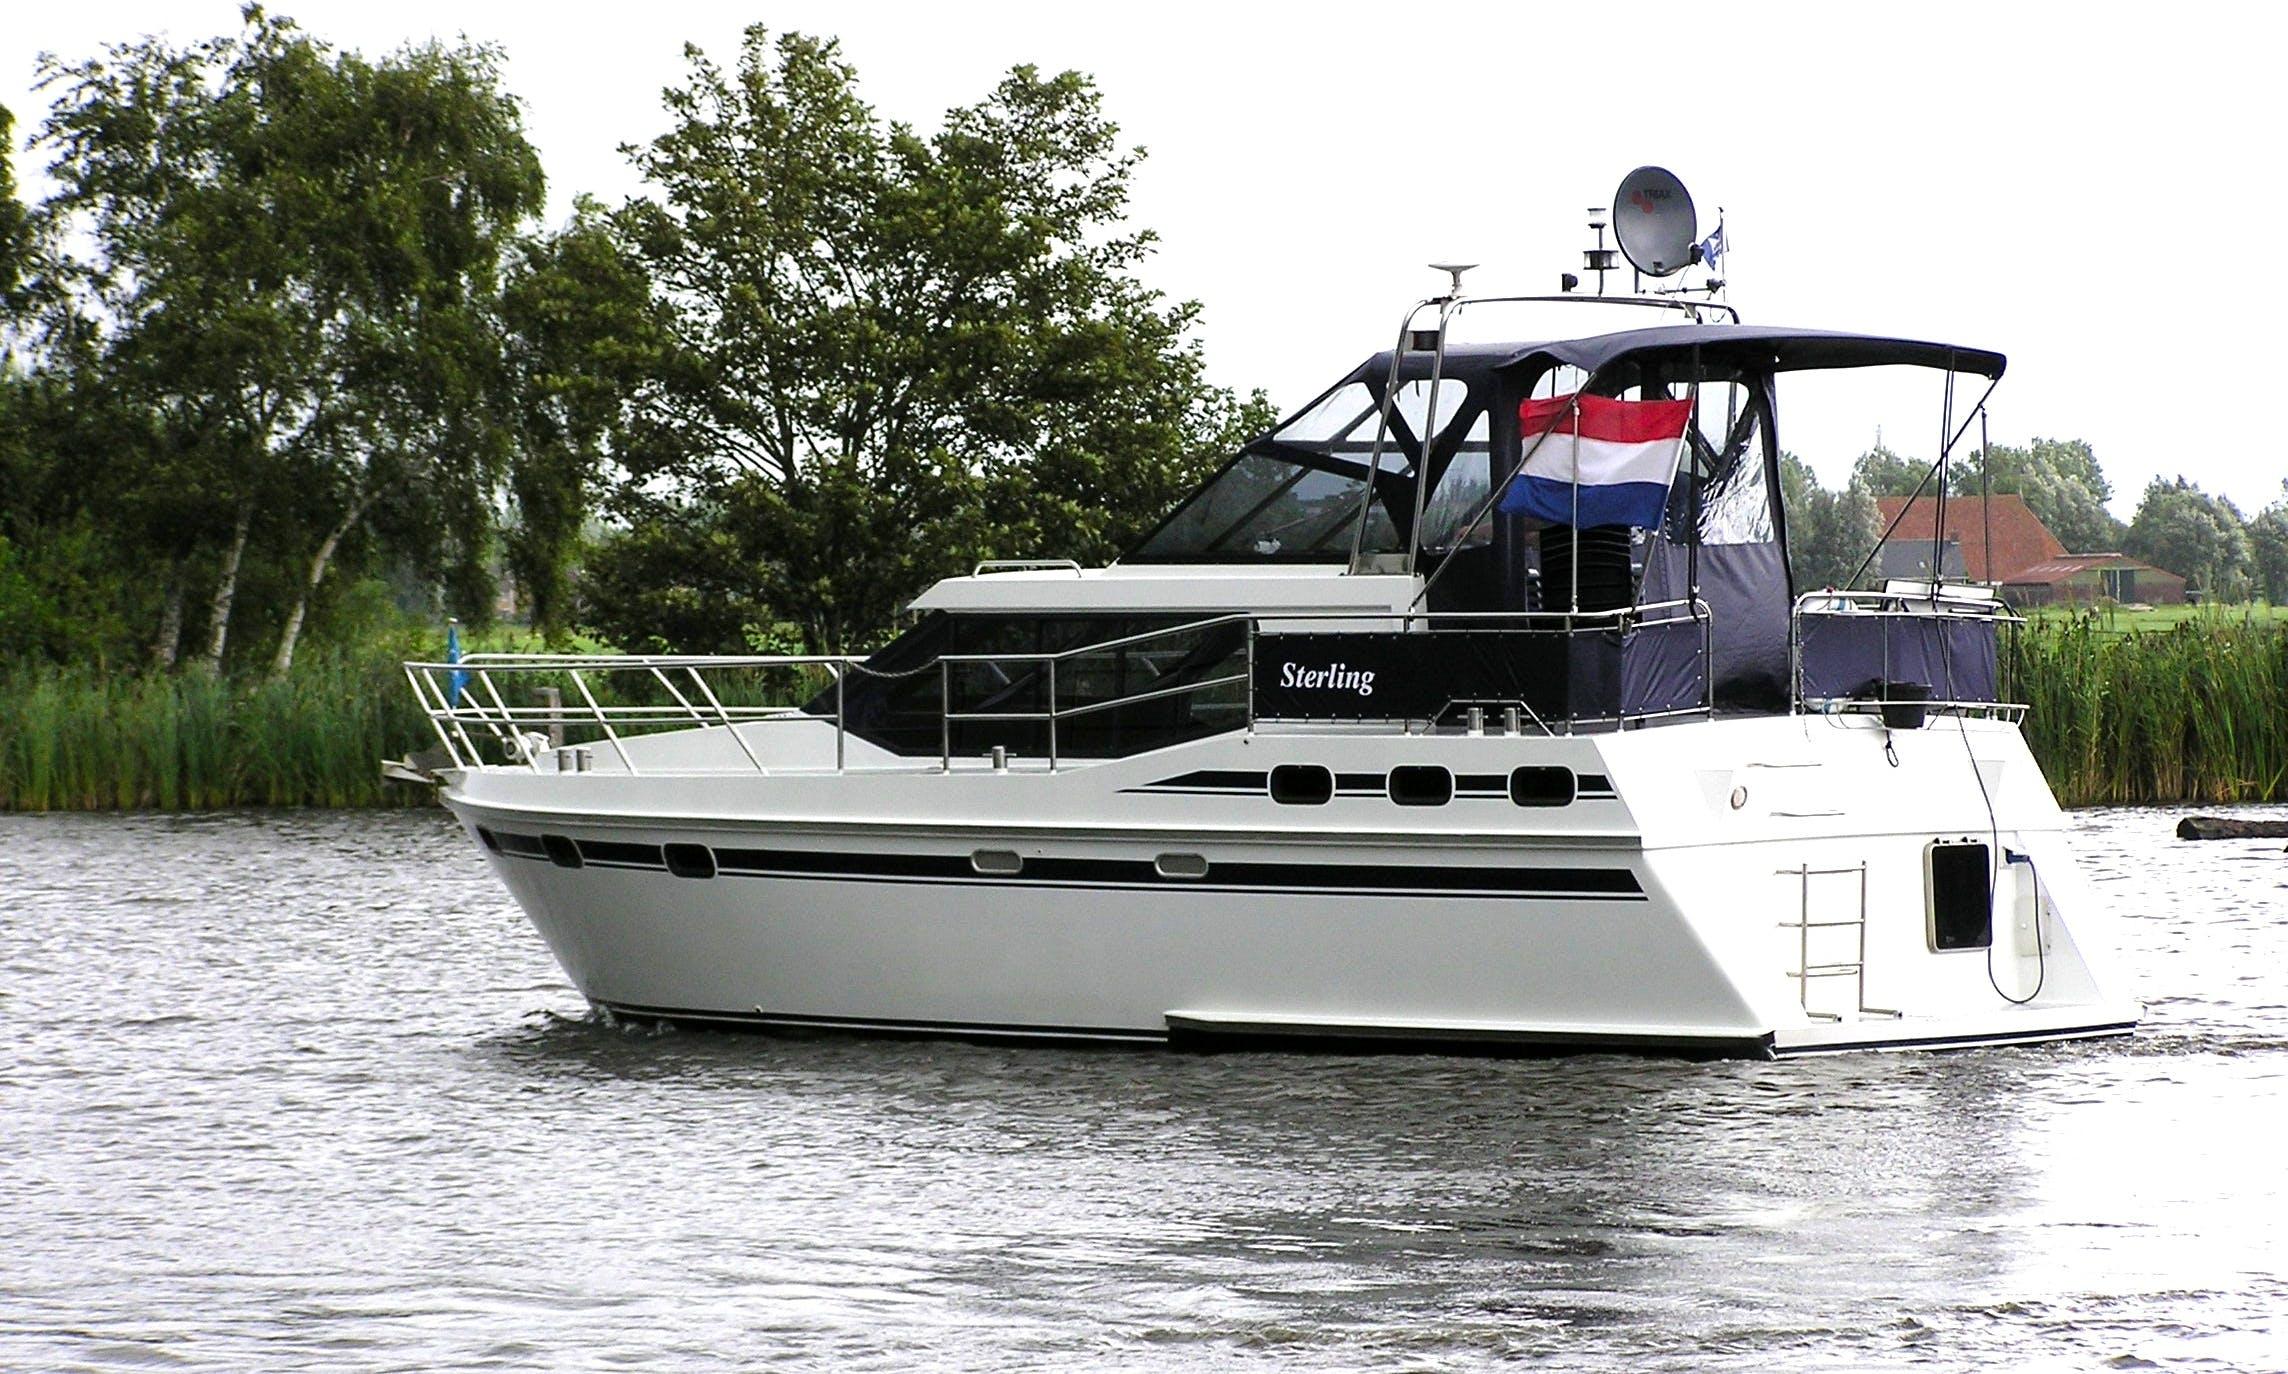 34' Vri-Jon Contessa 1040 Motor Yacht Charter in Drachten, Netherlands